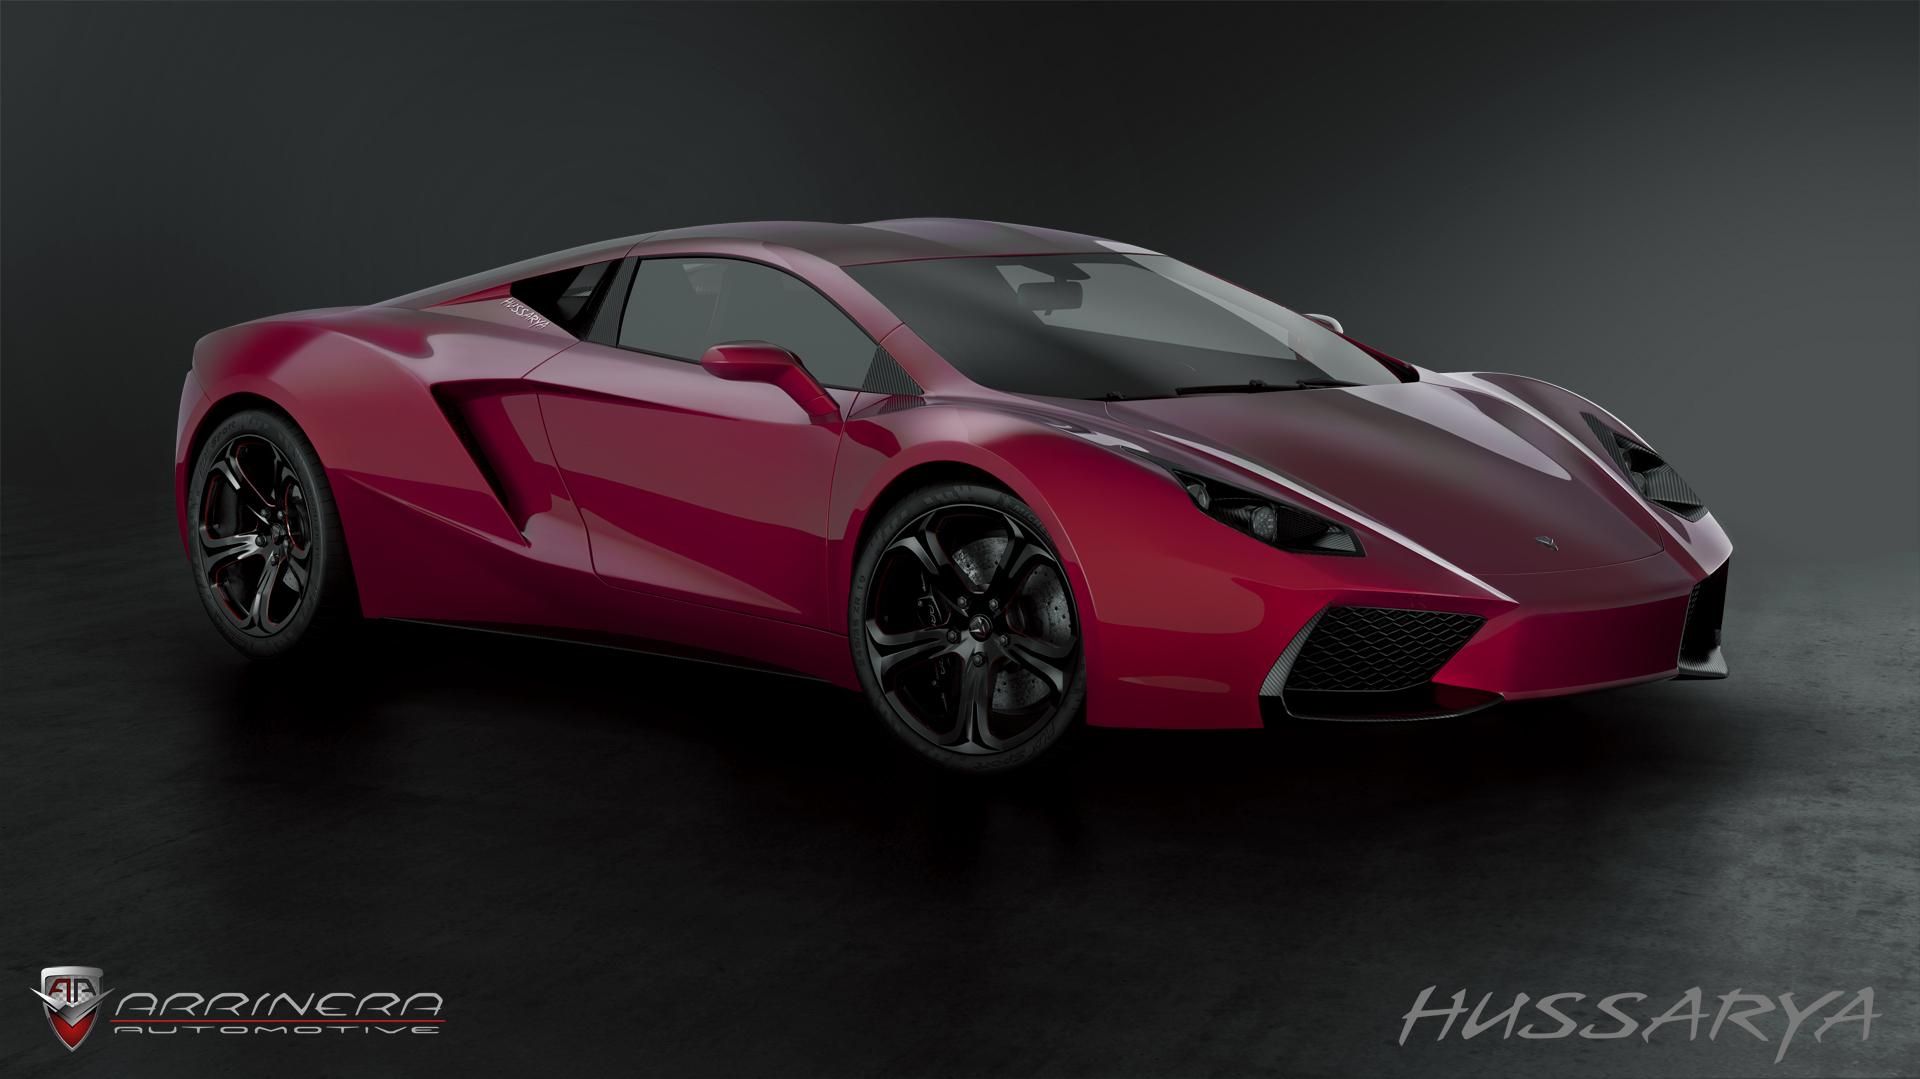 Arrinera Gives Its Super Car the Name Hussarya :: News :: autoviva.com